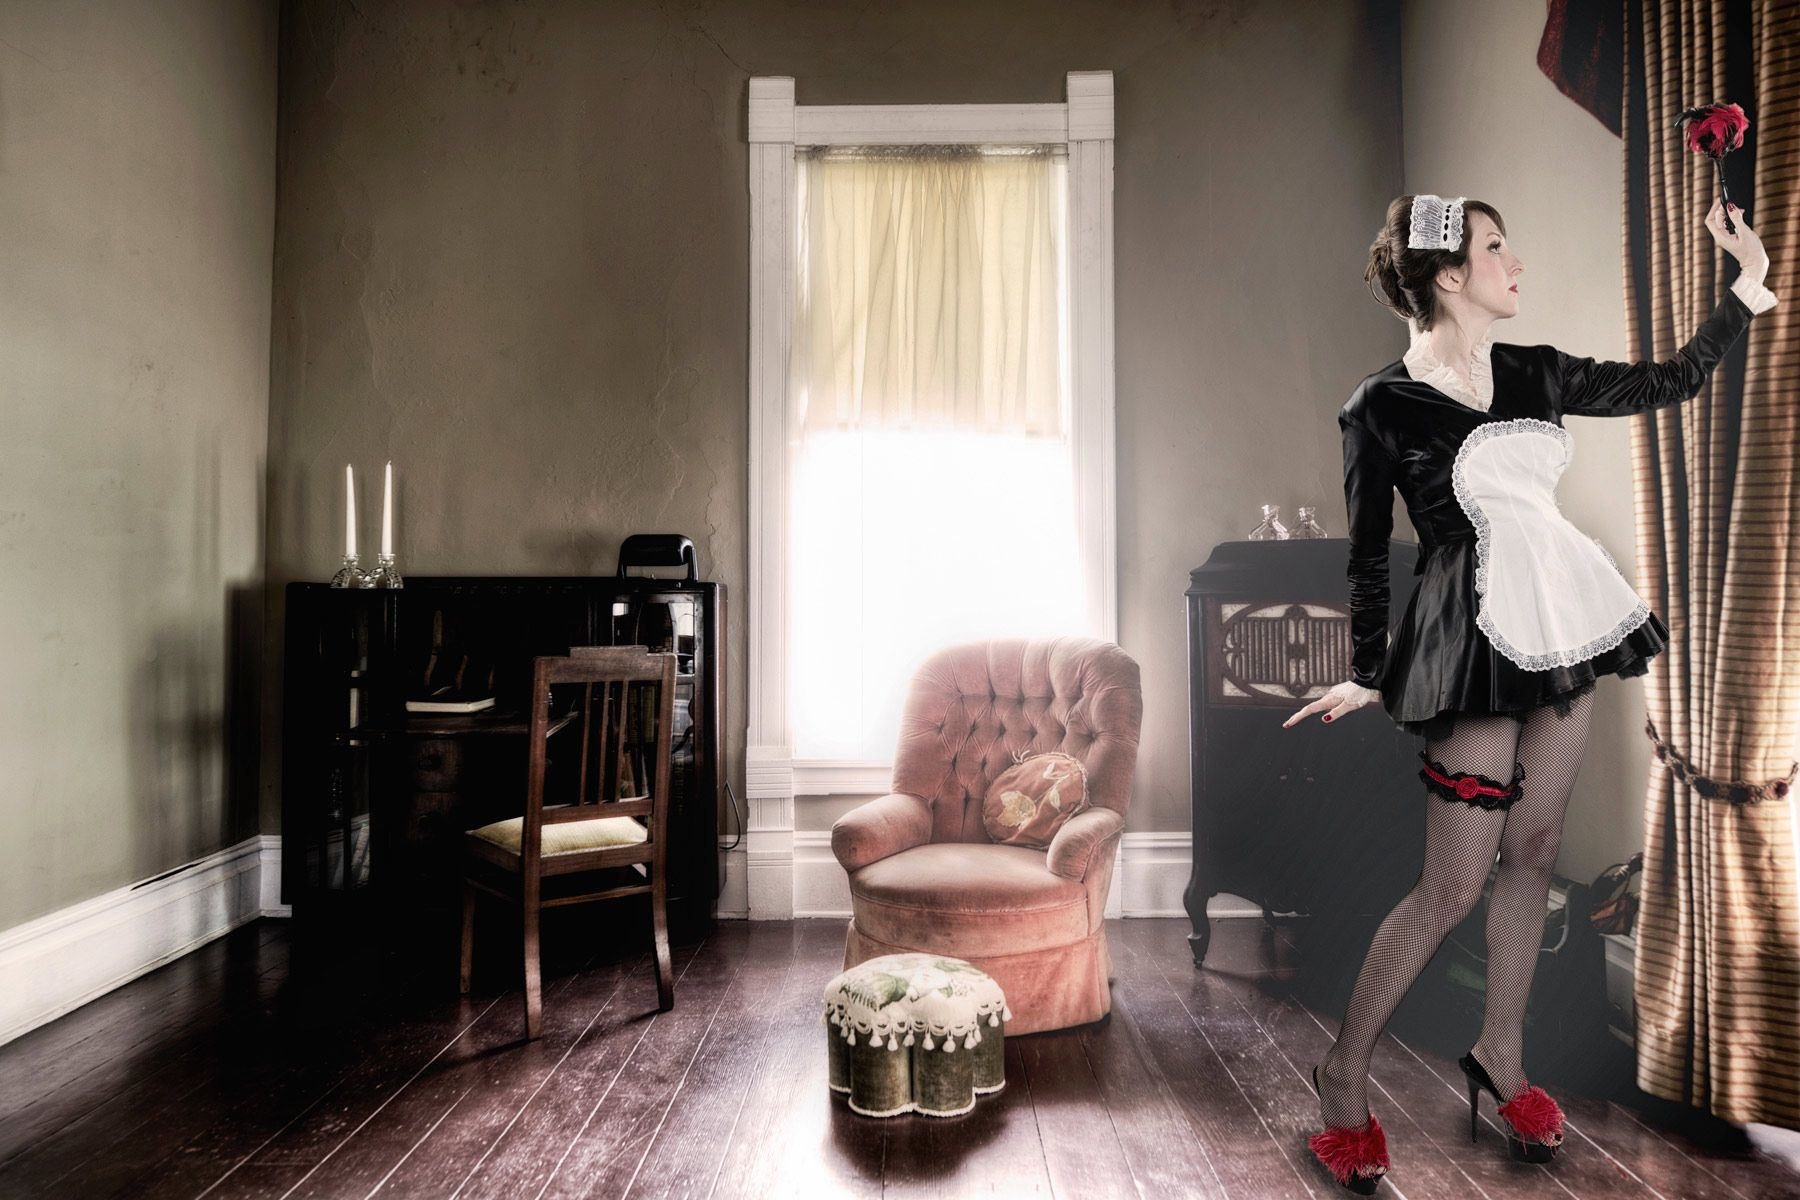 maid03